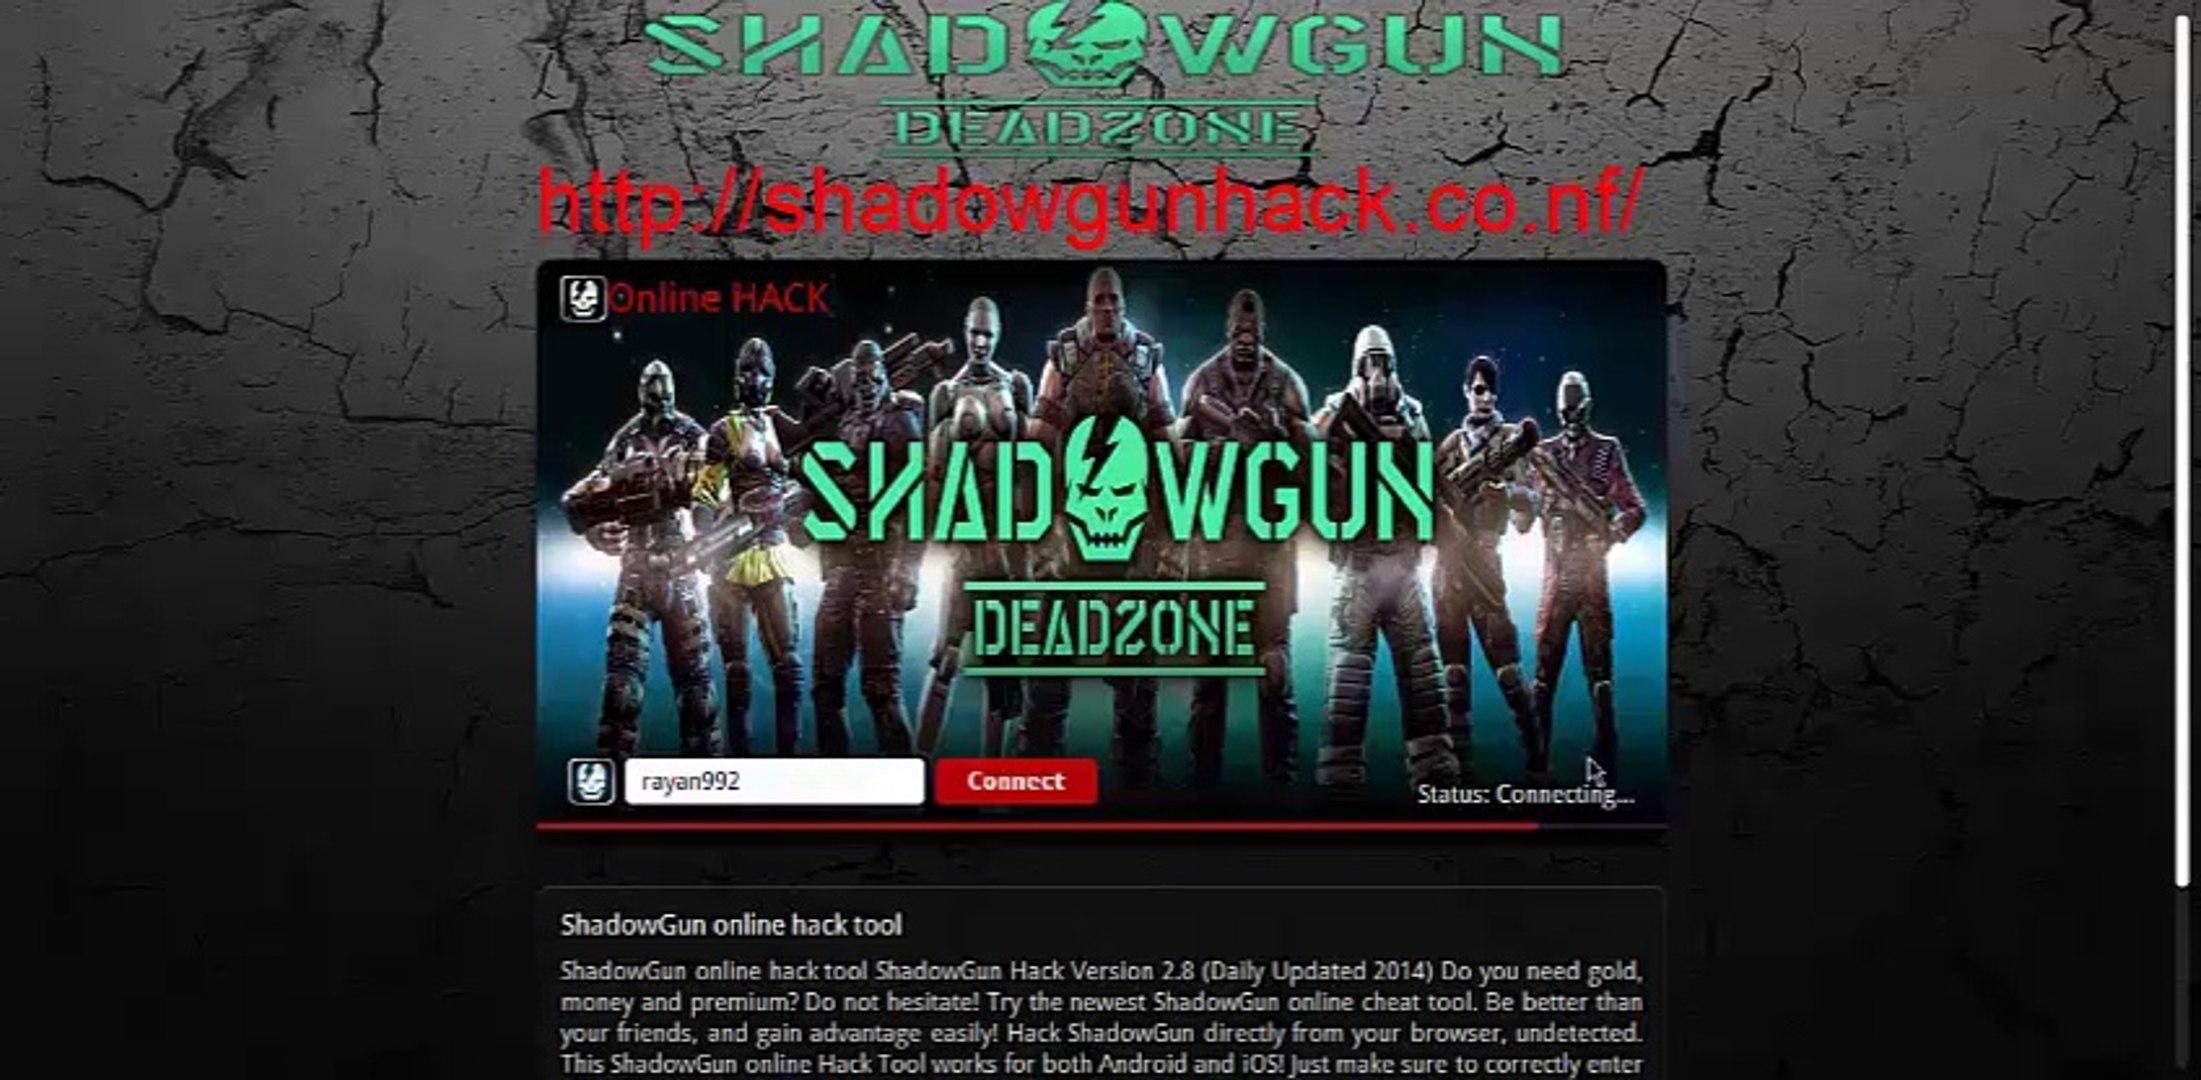 SHADOWGUN DeadZone Hack – Gold, Cash Cheats iOS Android 2014